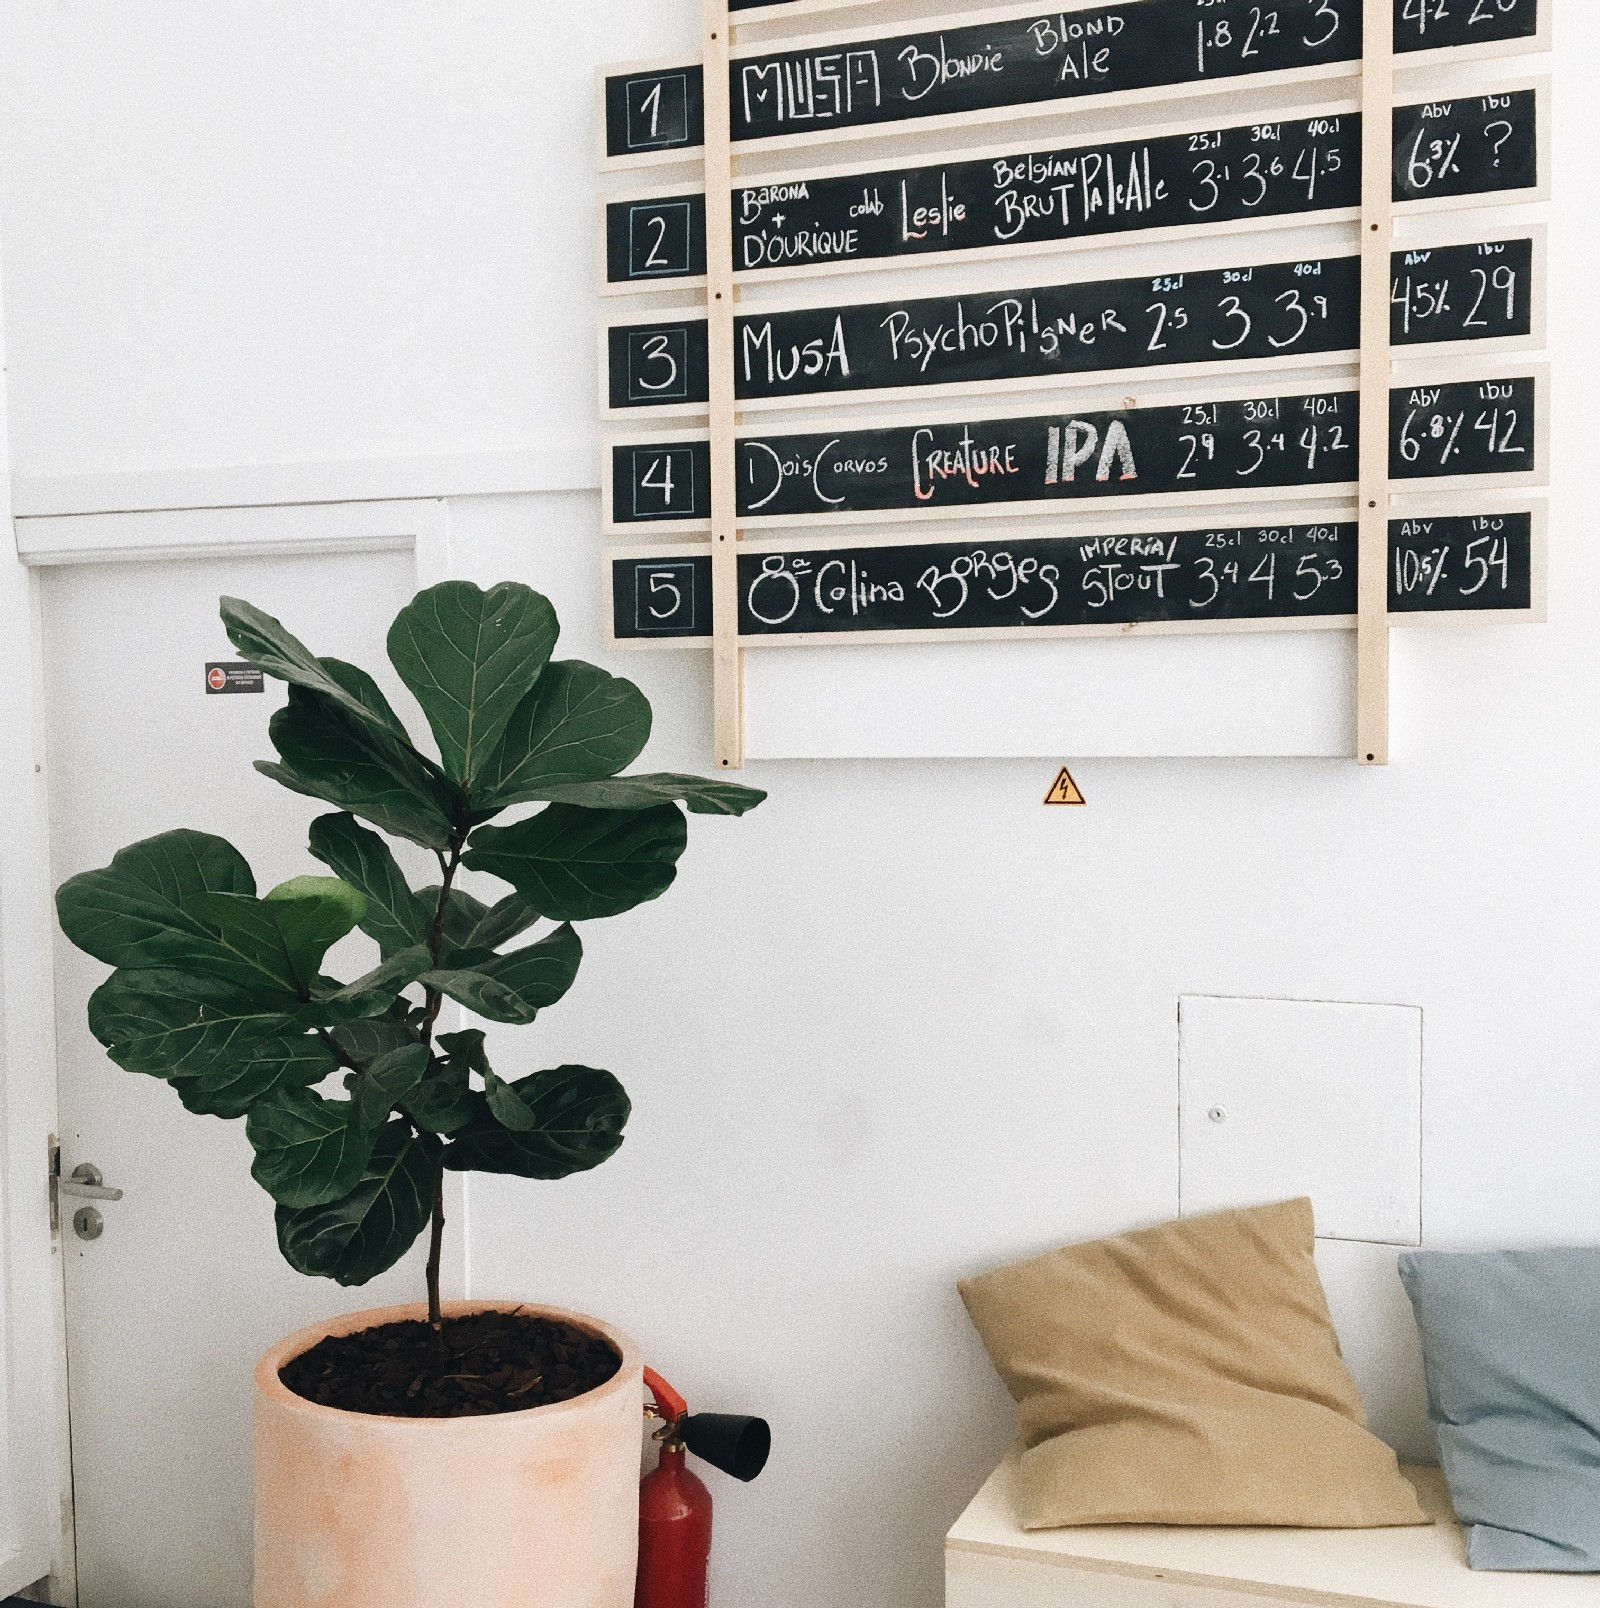 Copenhagen Coffee Lab Alcantara